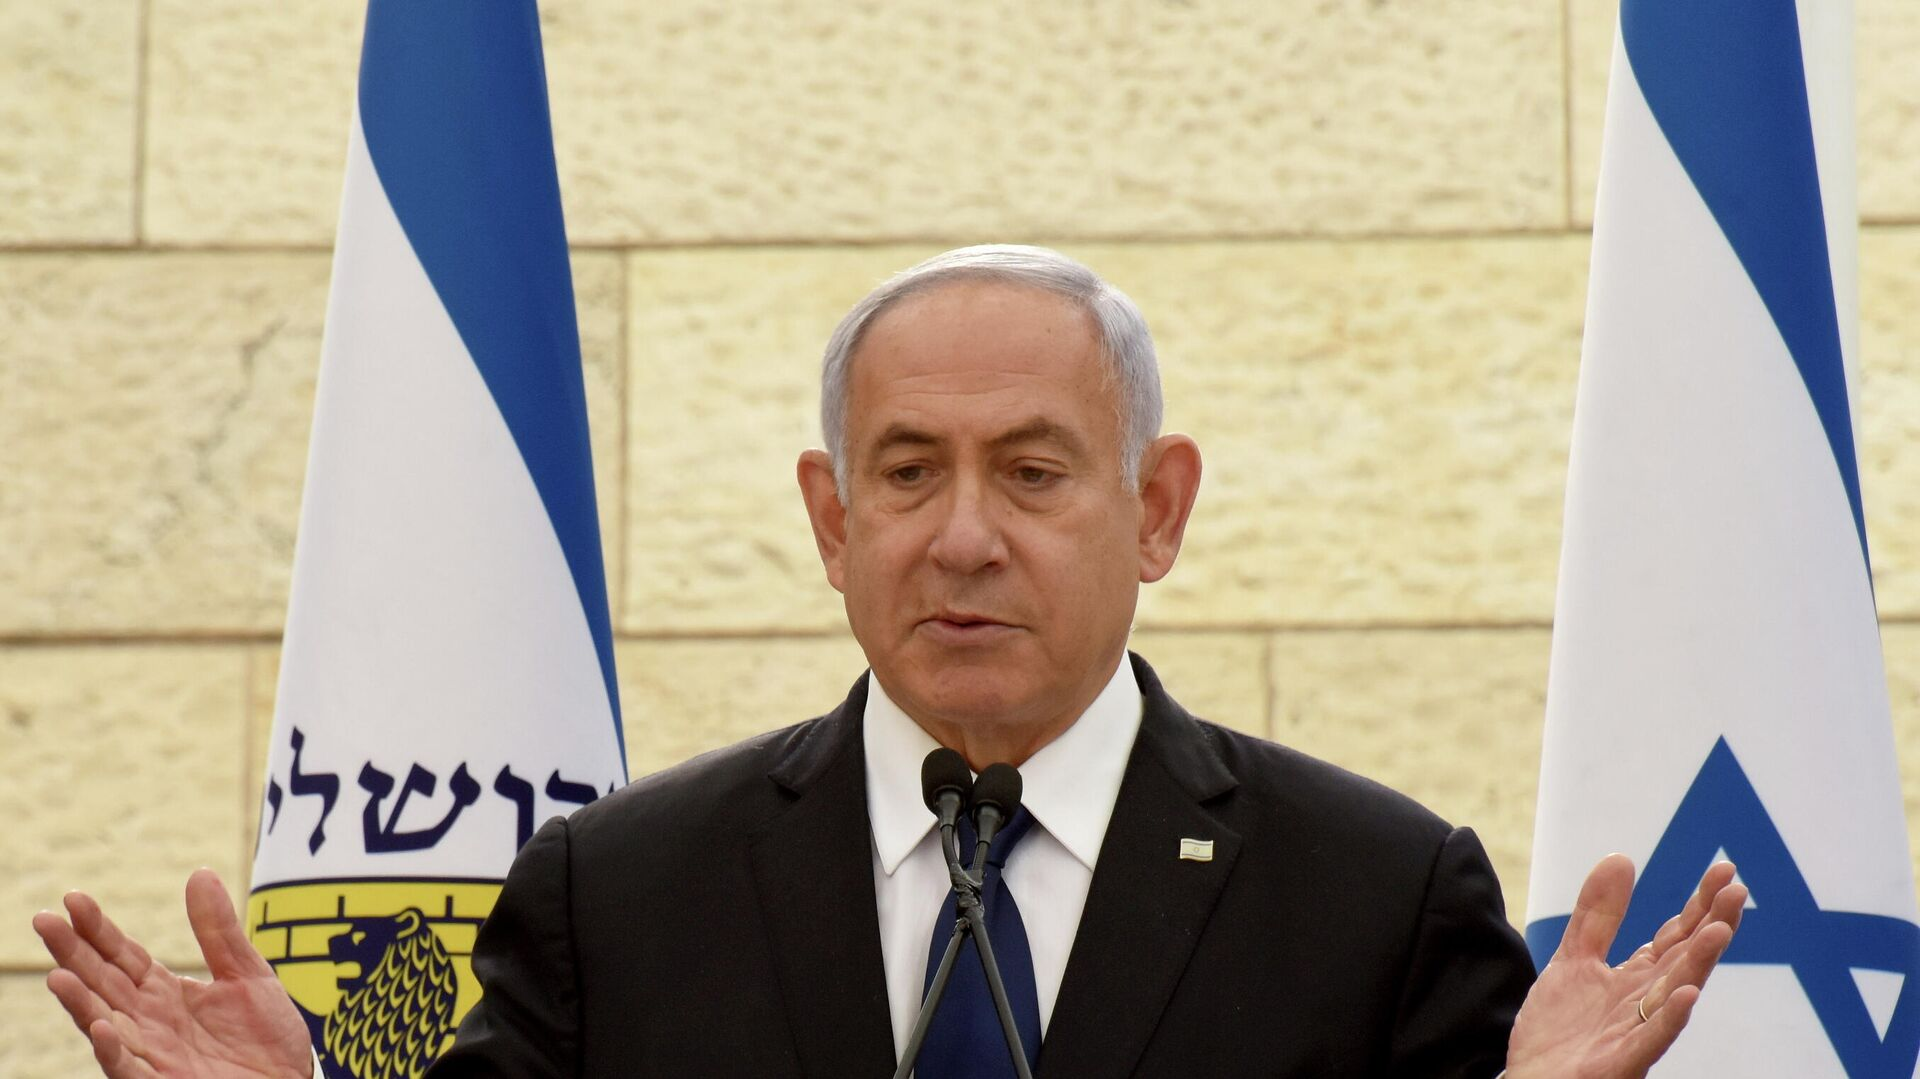 Benjamín Netanyahu, primer ministro israelí - Sputnik Mundo, 1920, 30.05.2021